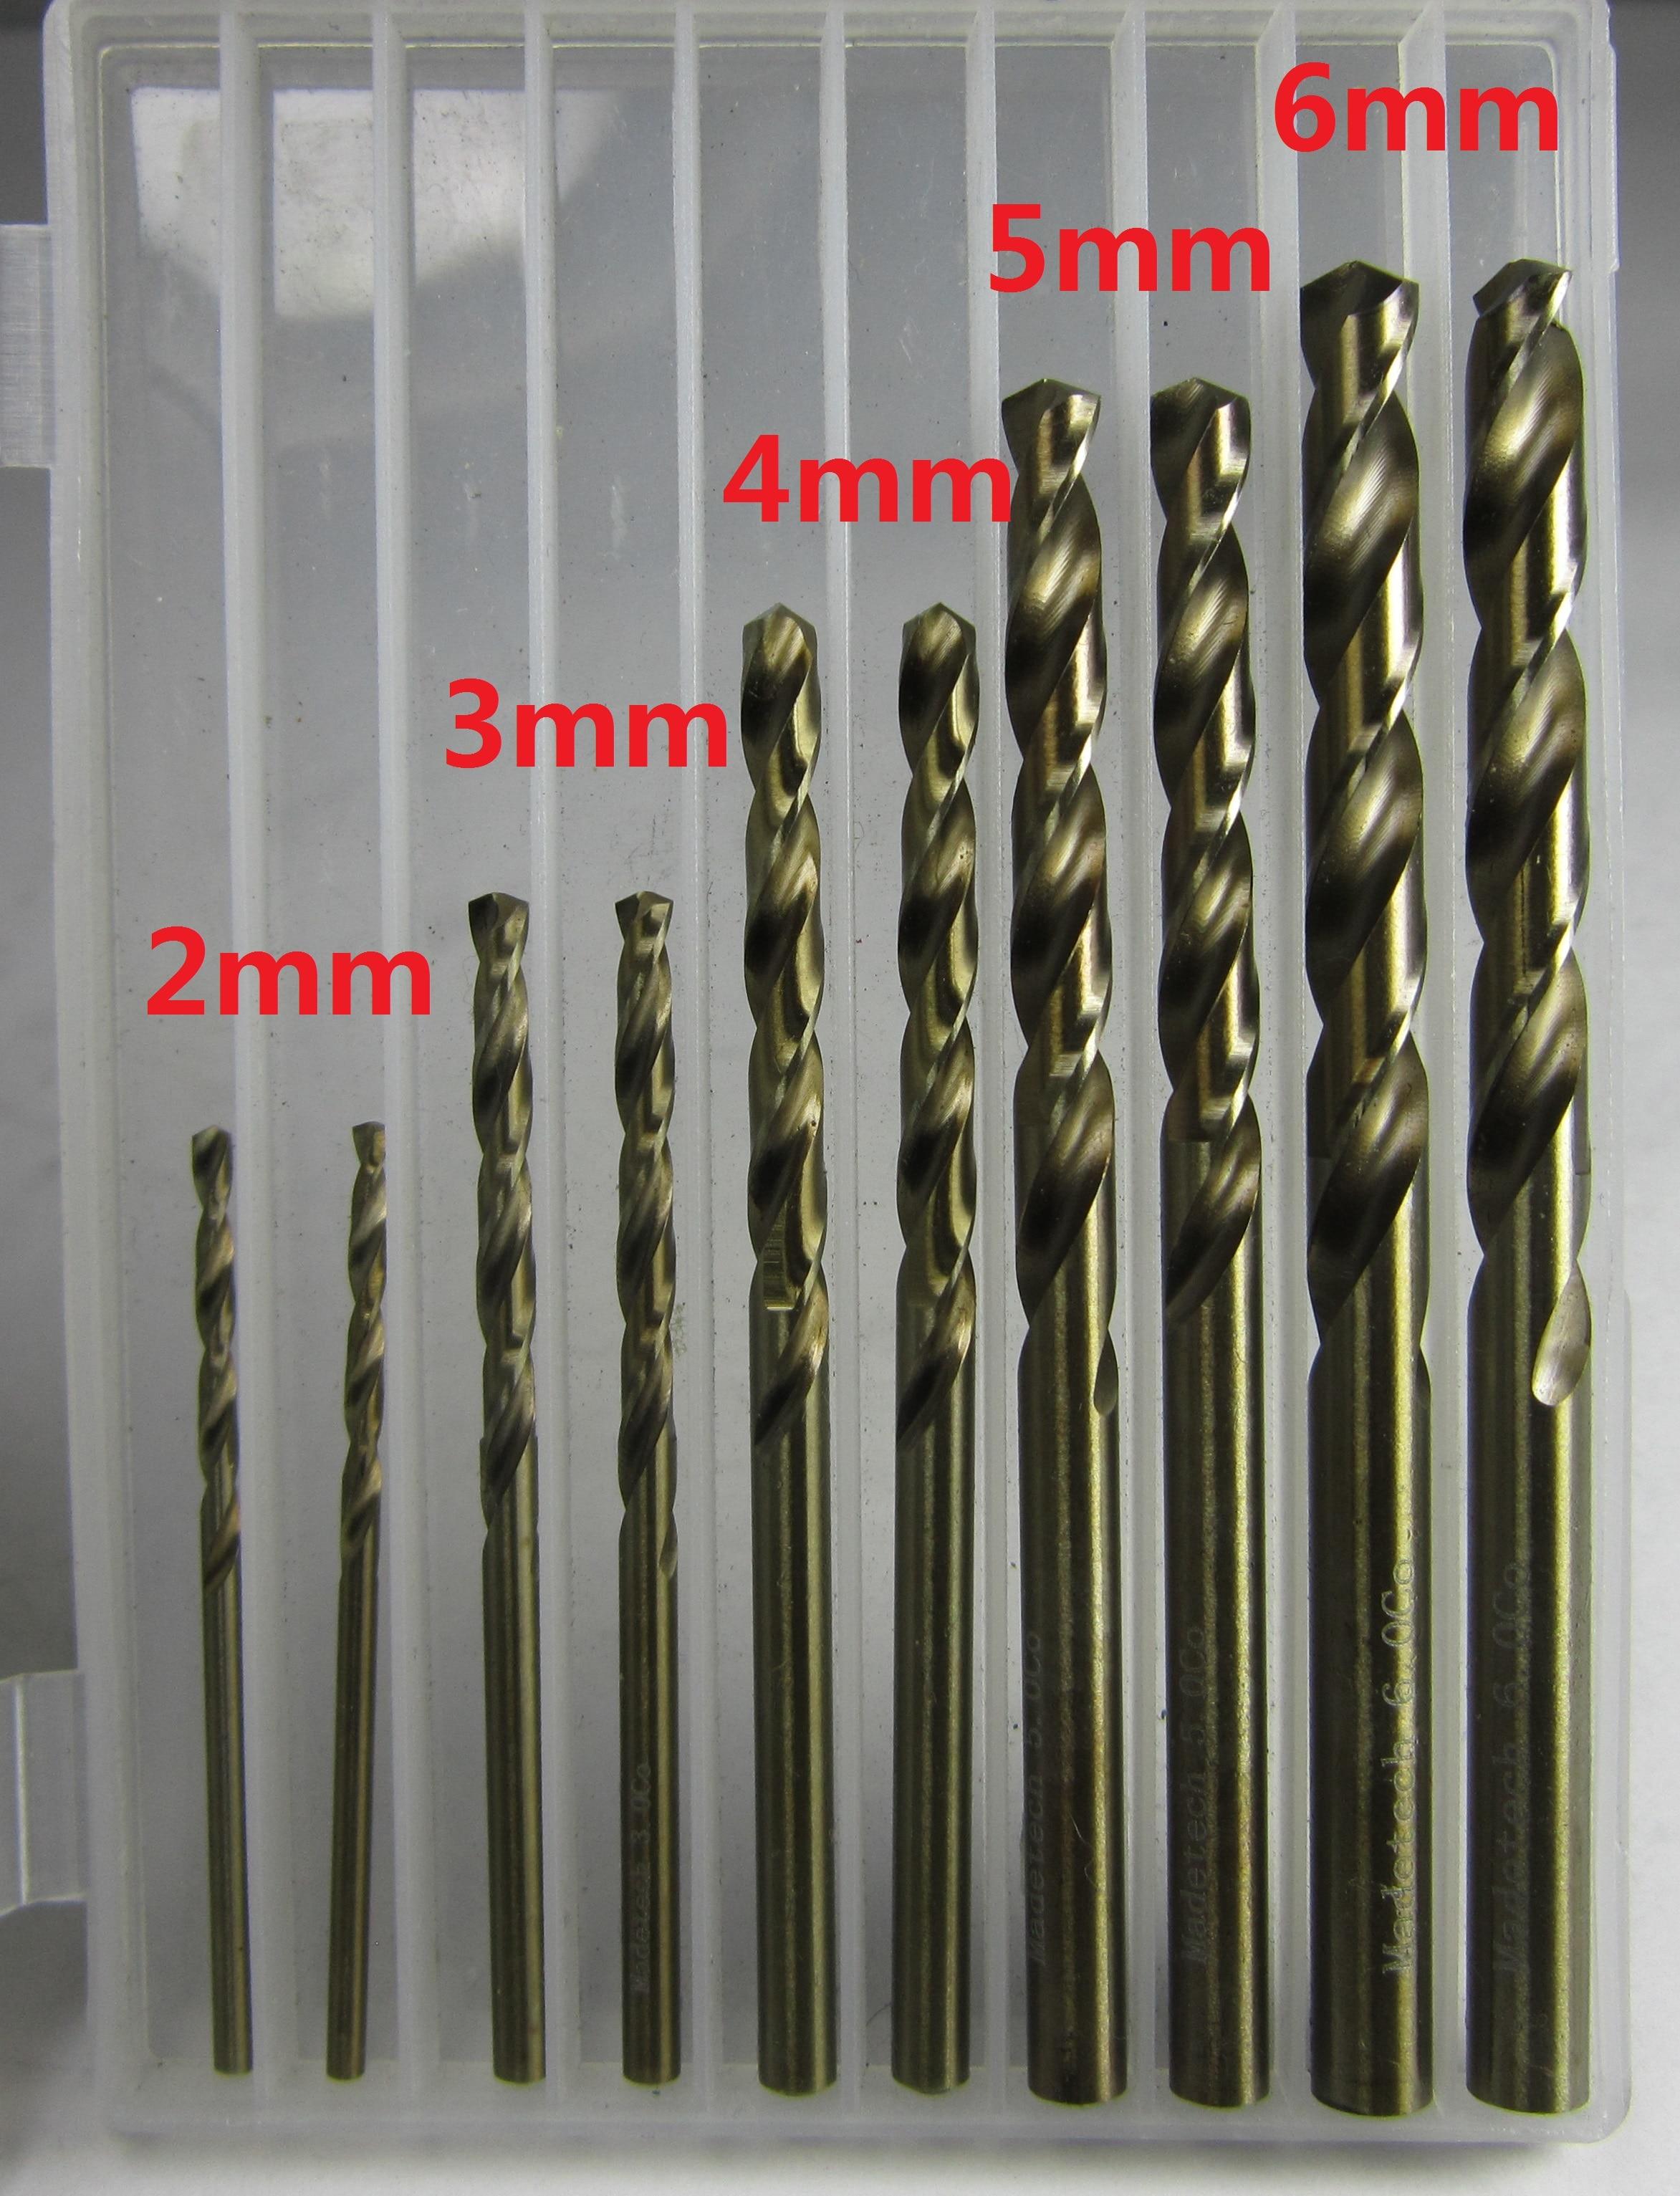 Freeshipping 10PCS HSS-CO M35 Cobalt Twist Drill Bit High Precision Metal Hole Processing Electric Drill Ø 2mm 3mm 4mm 5mm 6mm